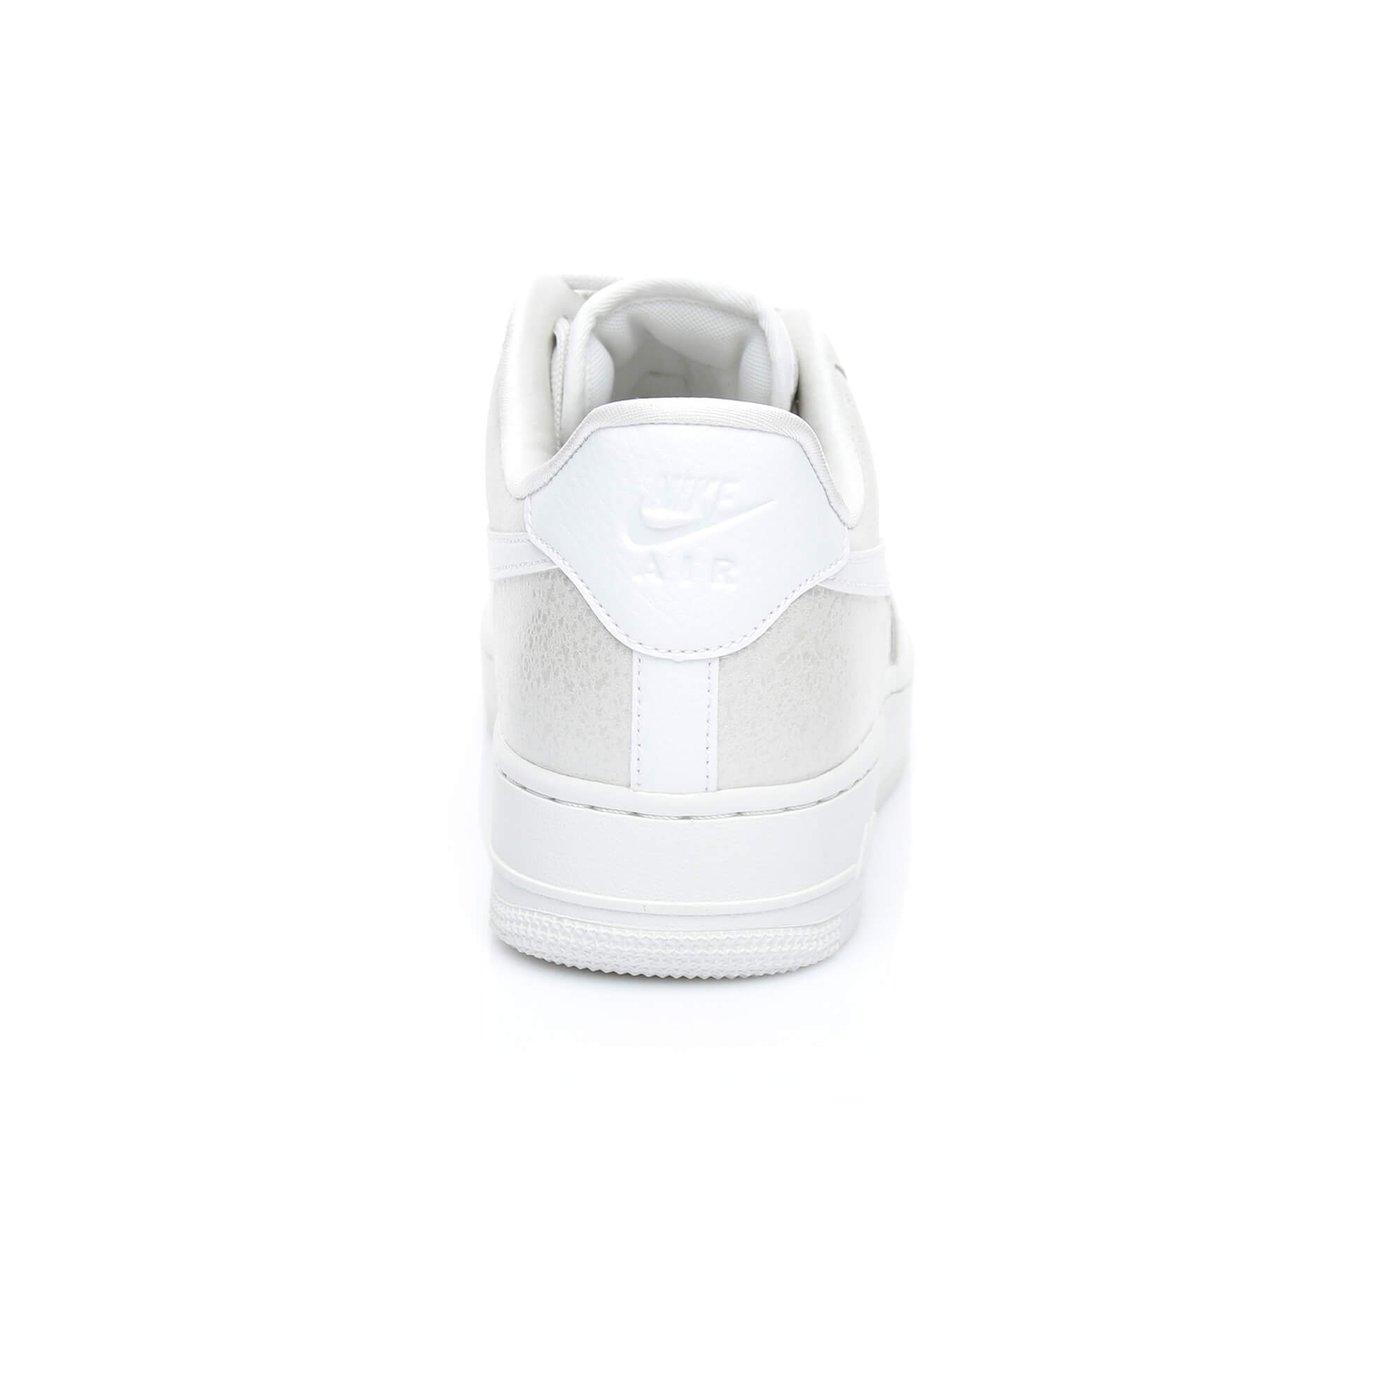 Nike Air Force 1 '07 Prm Kadın Beyaz Sneaker